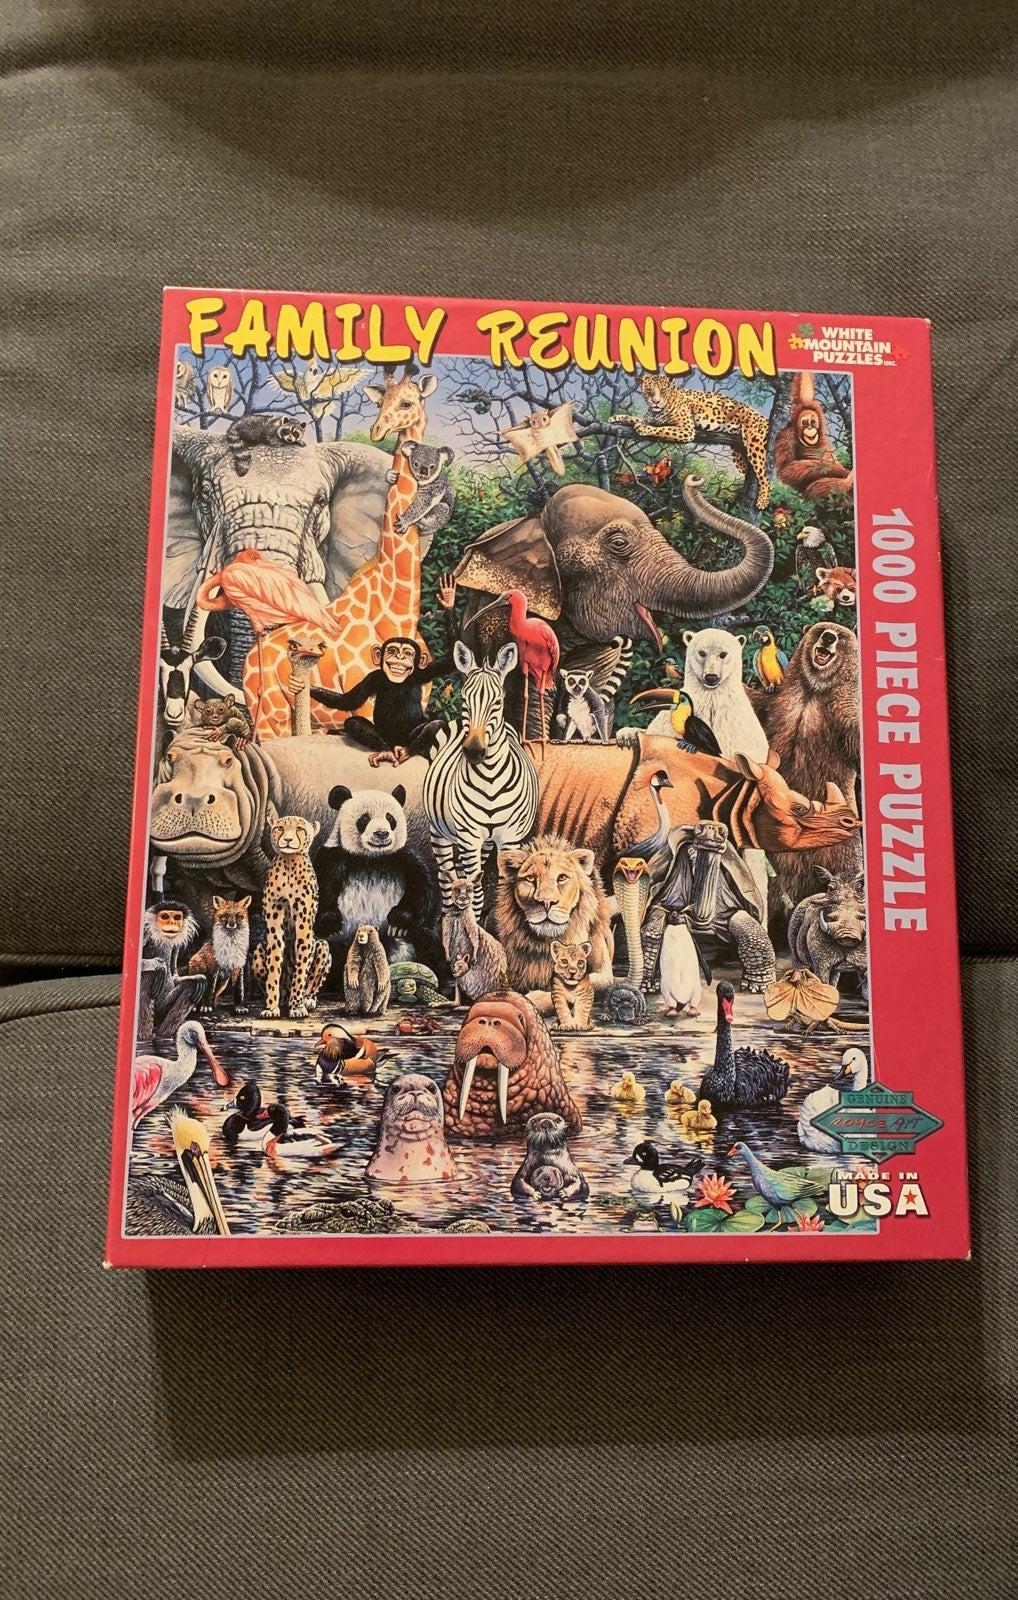 1000 piece puzzle -Animals